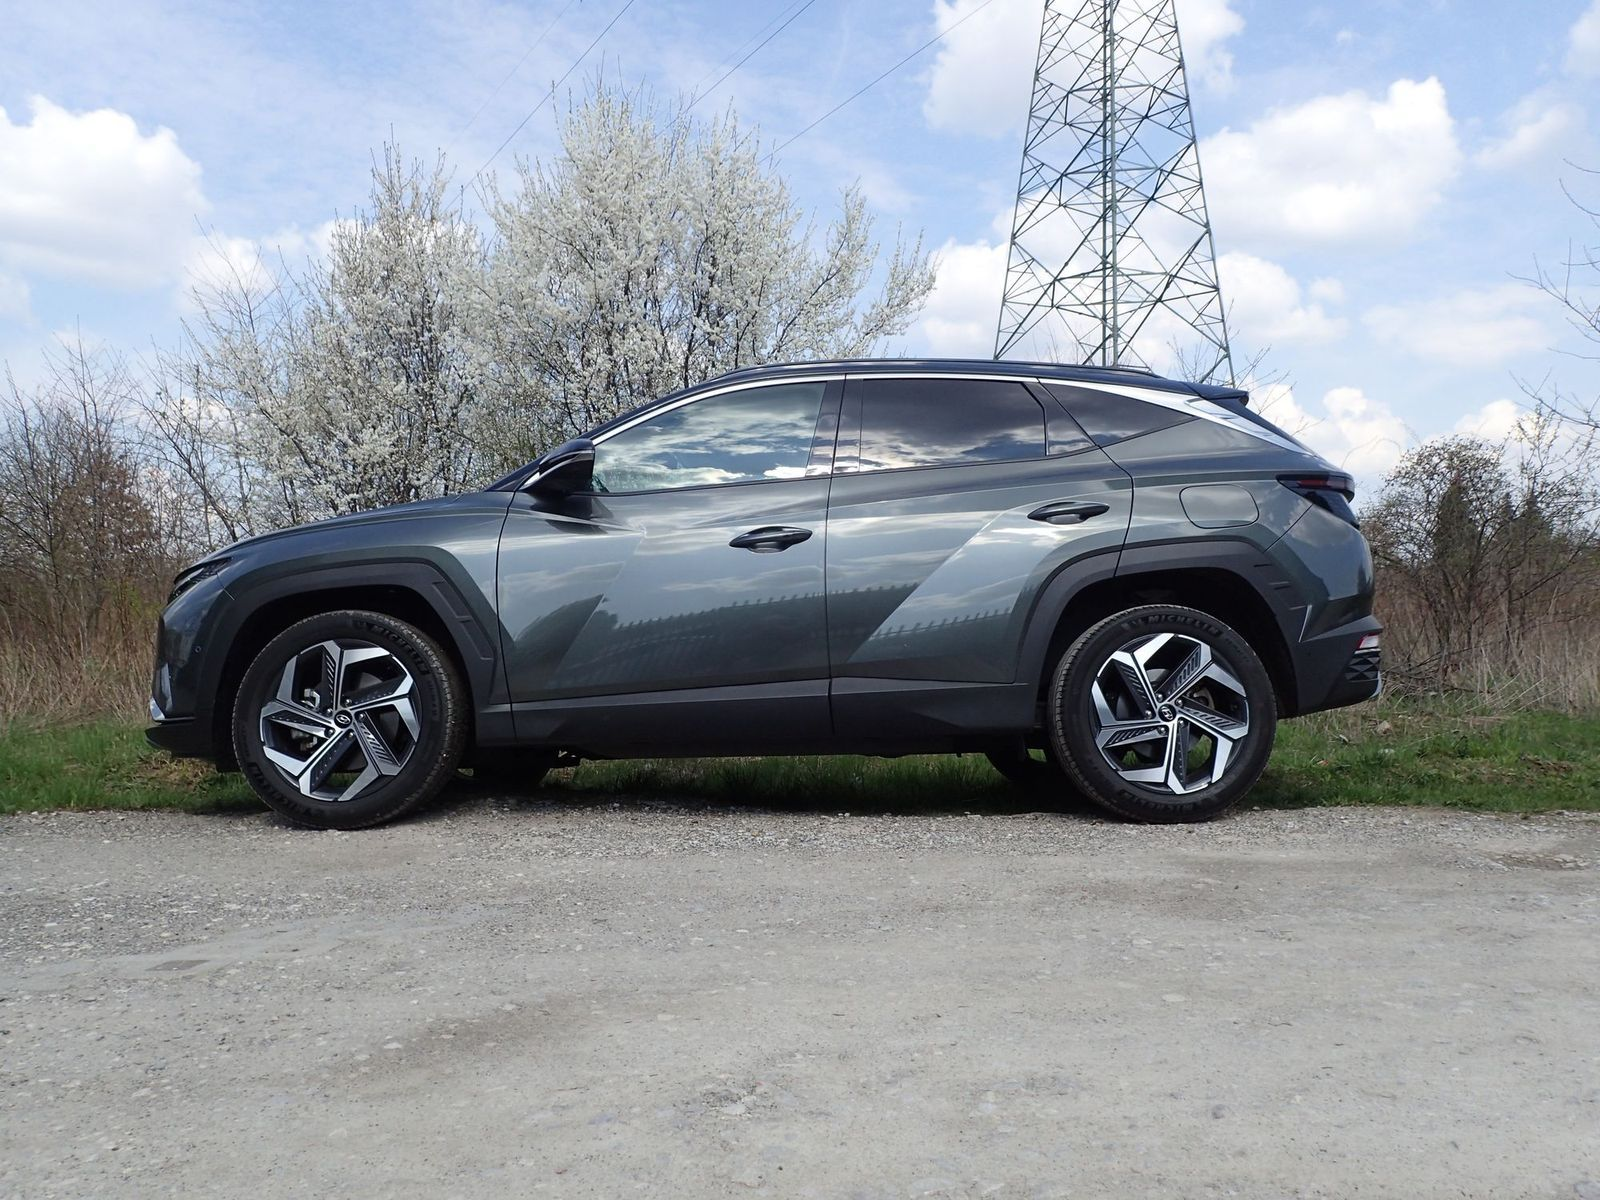 HyundaiTucson_2021_01